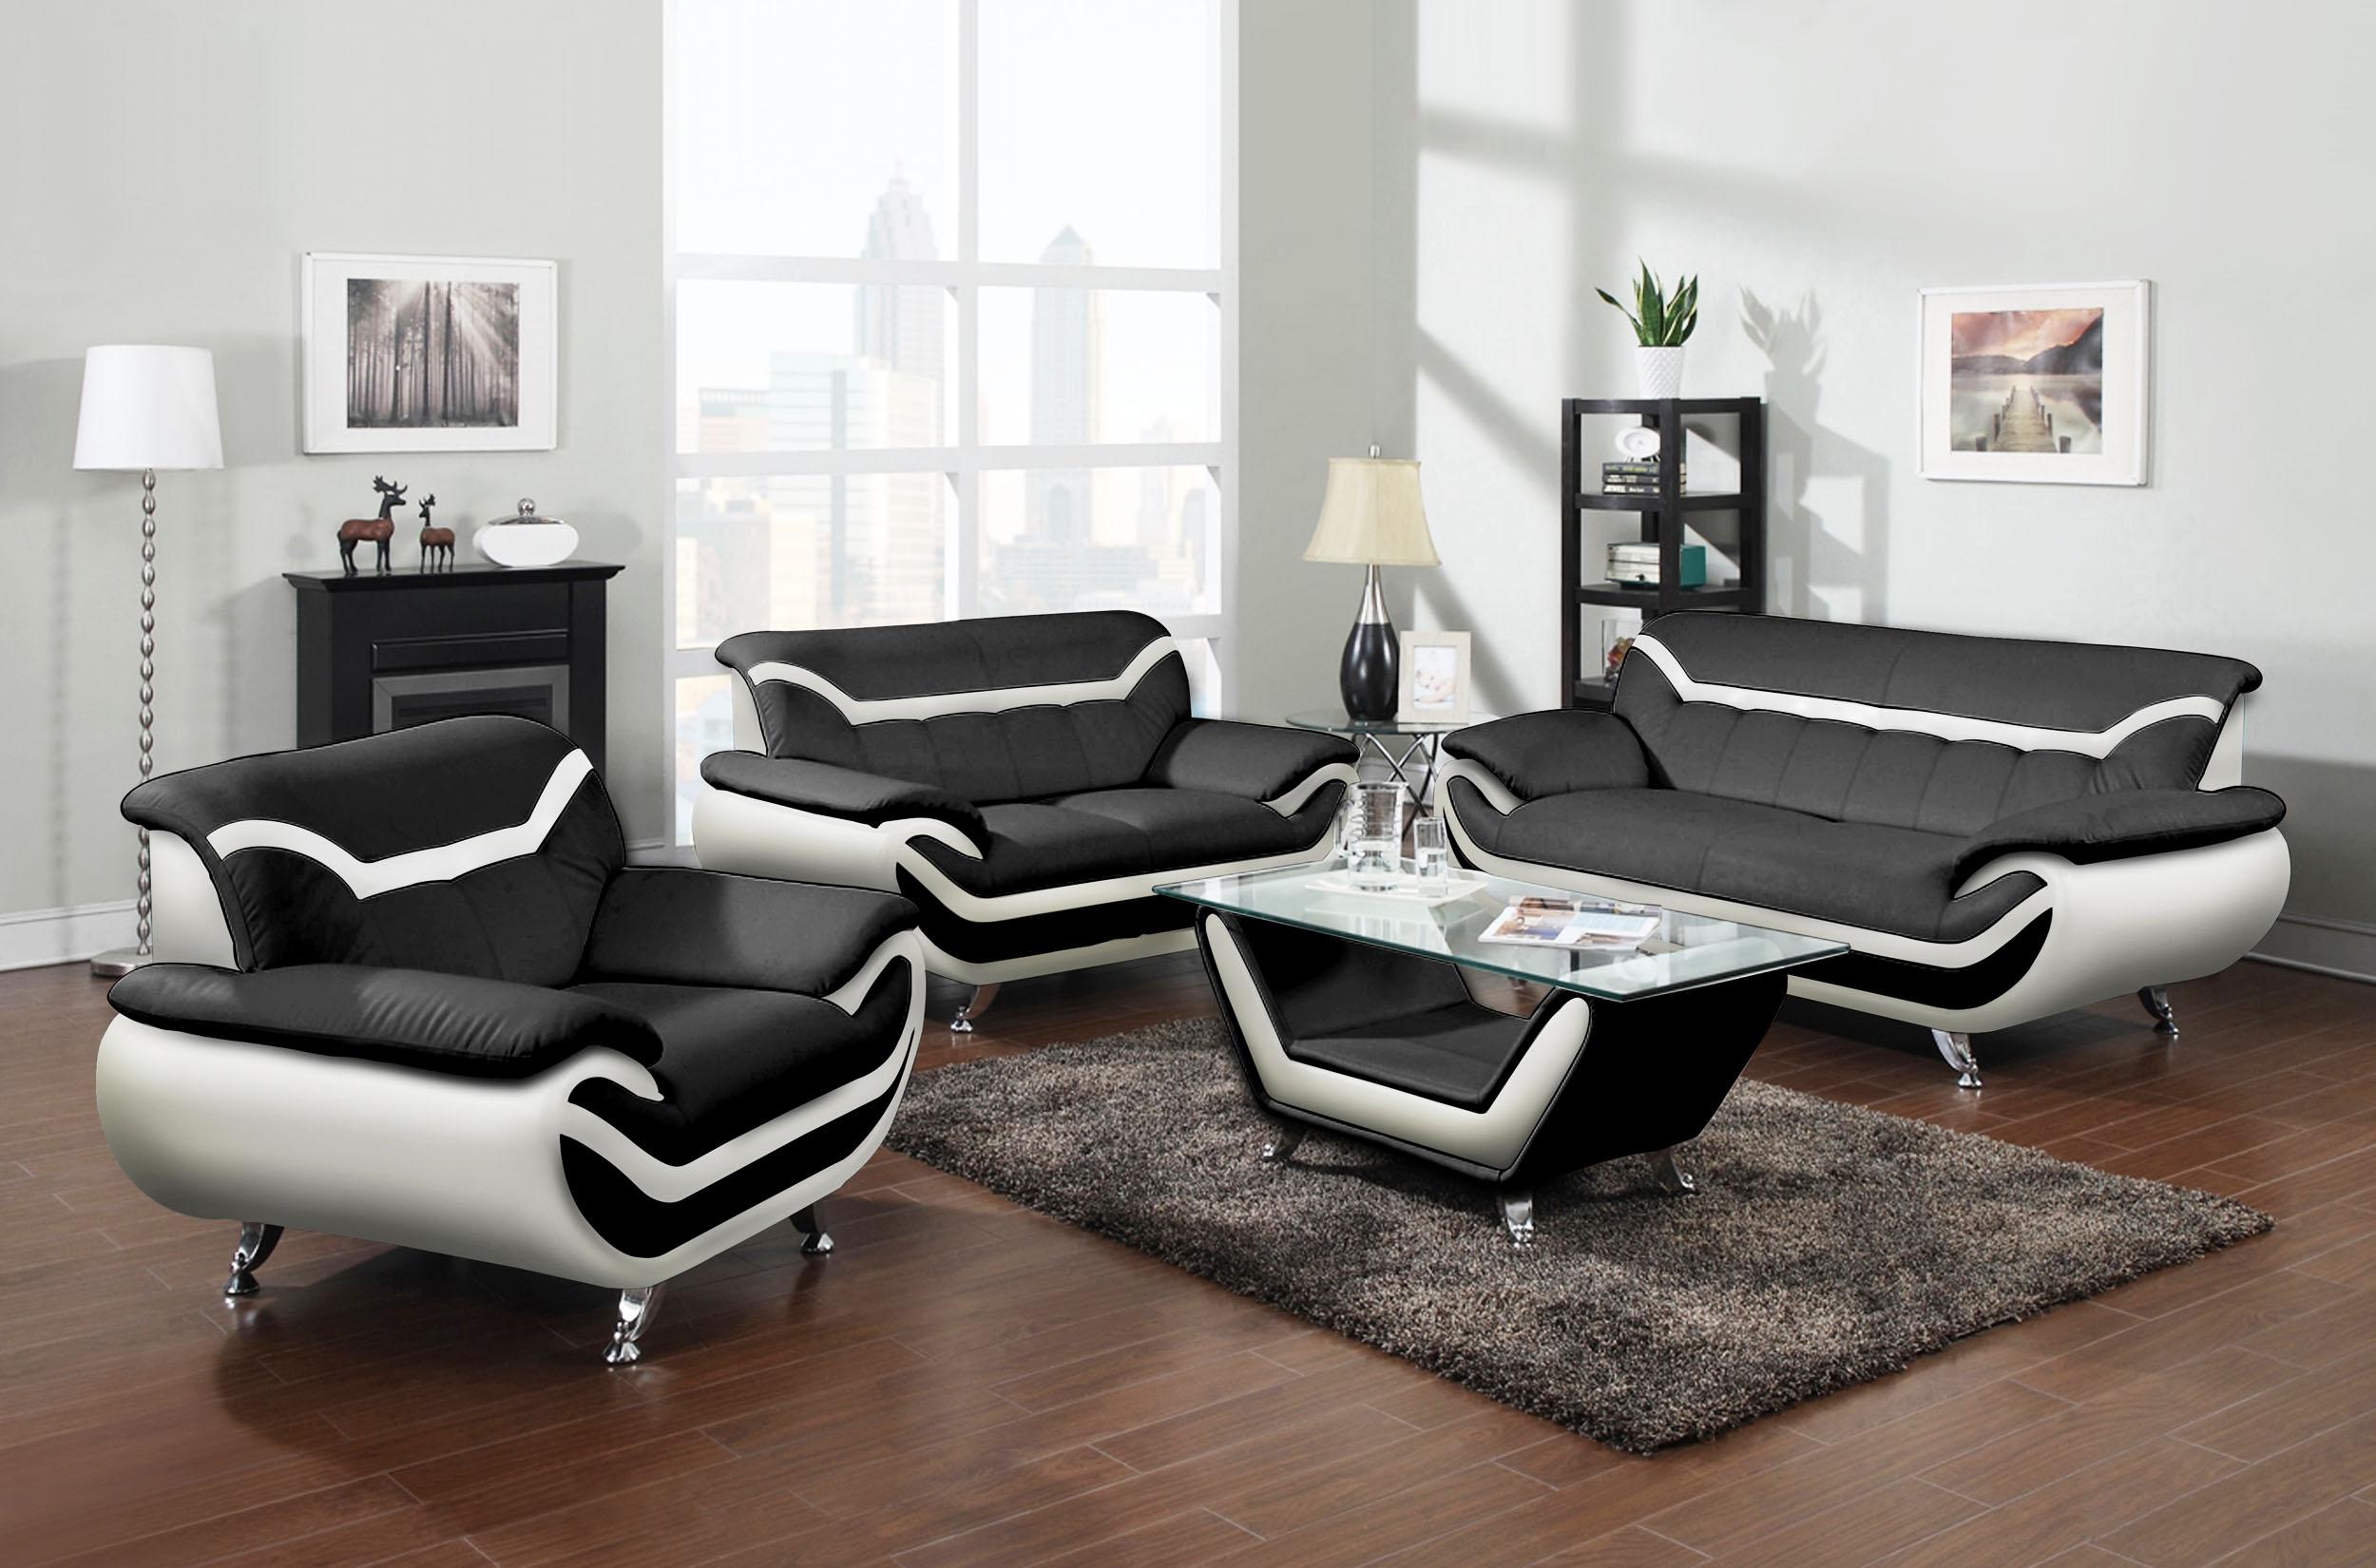 Adona 3pc Leather Gel Sofa Loveseat Amp Chair Black Amp White